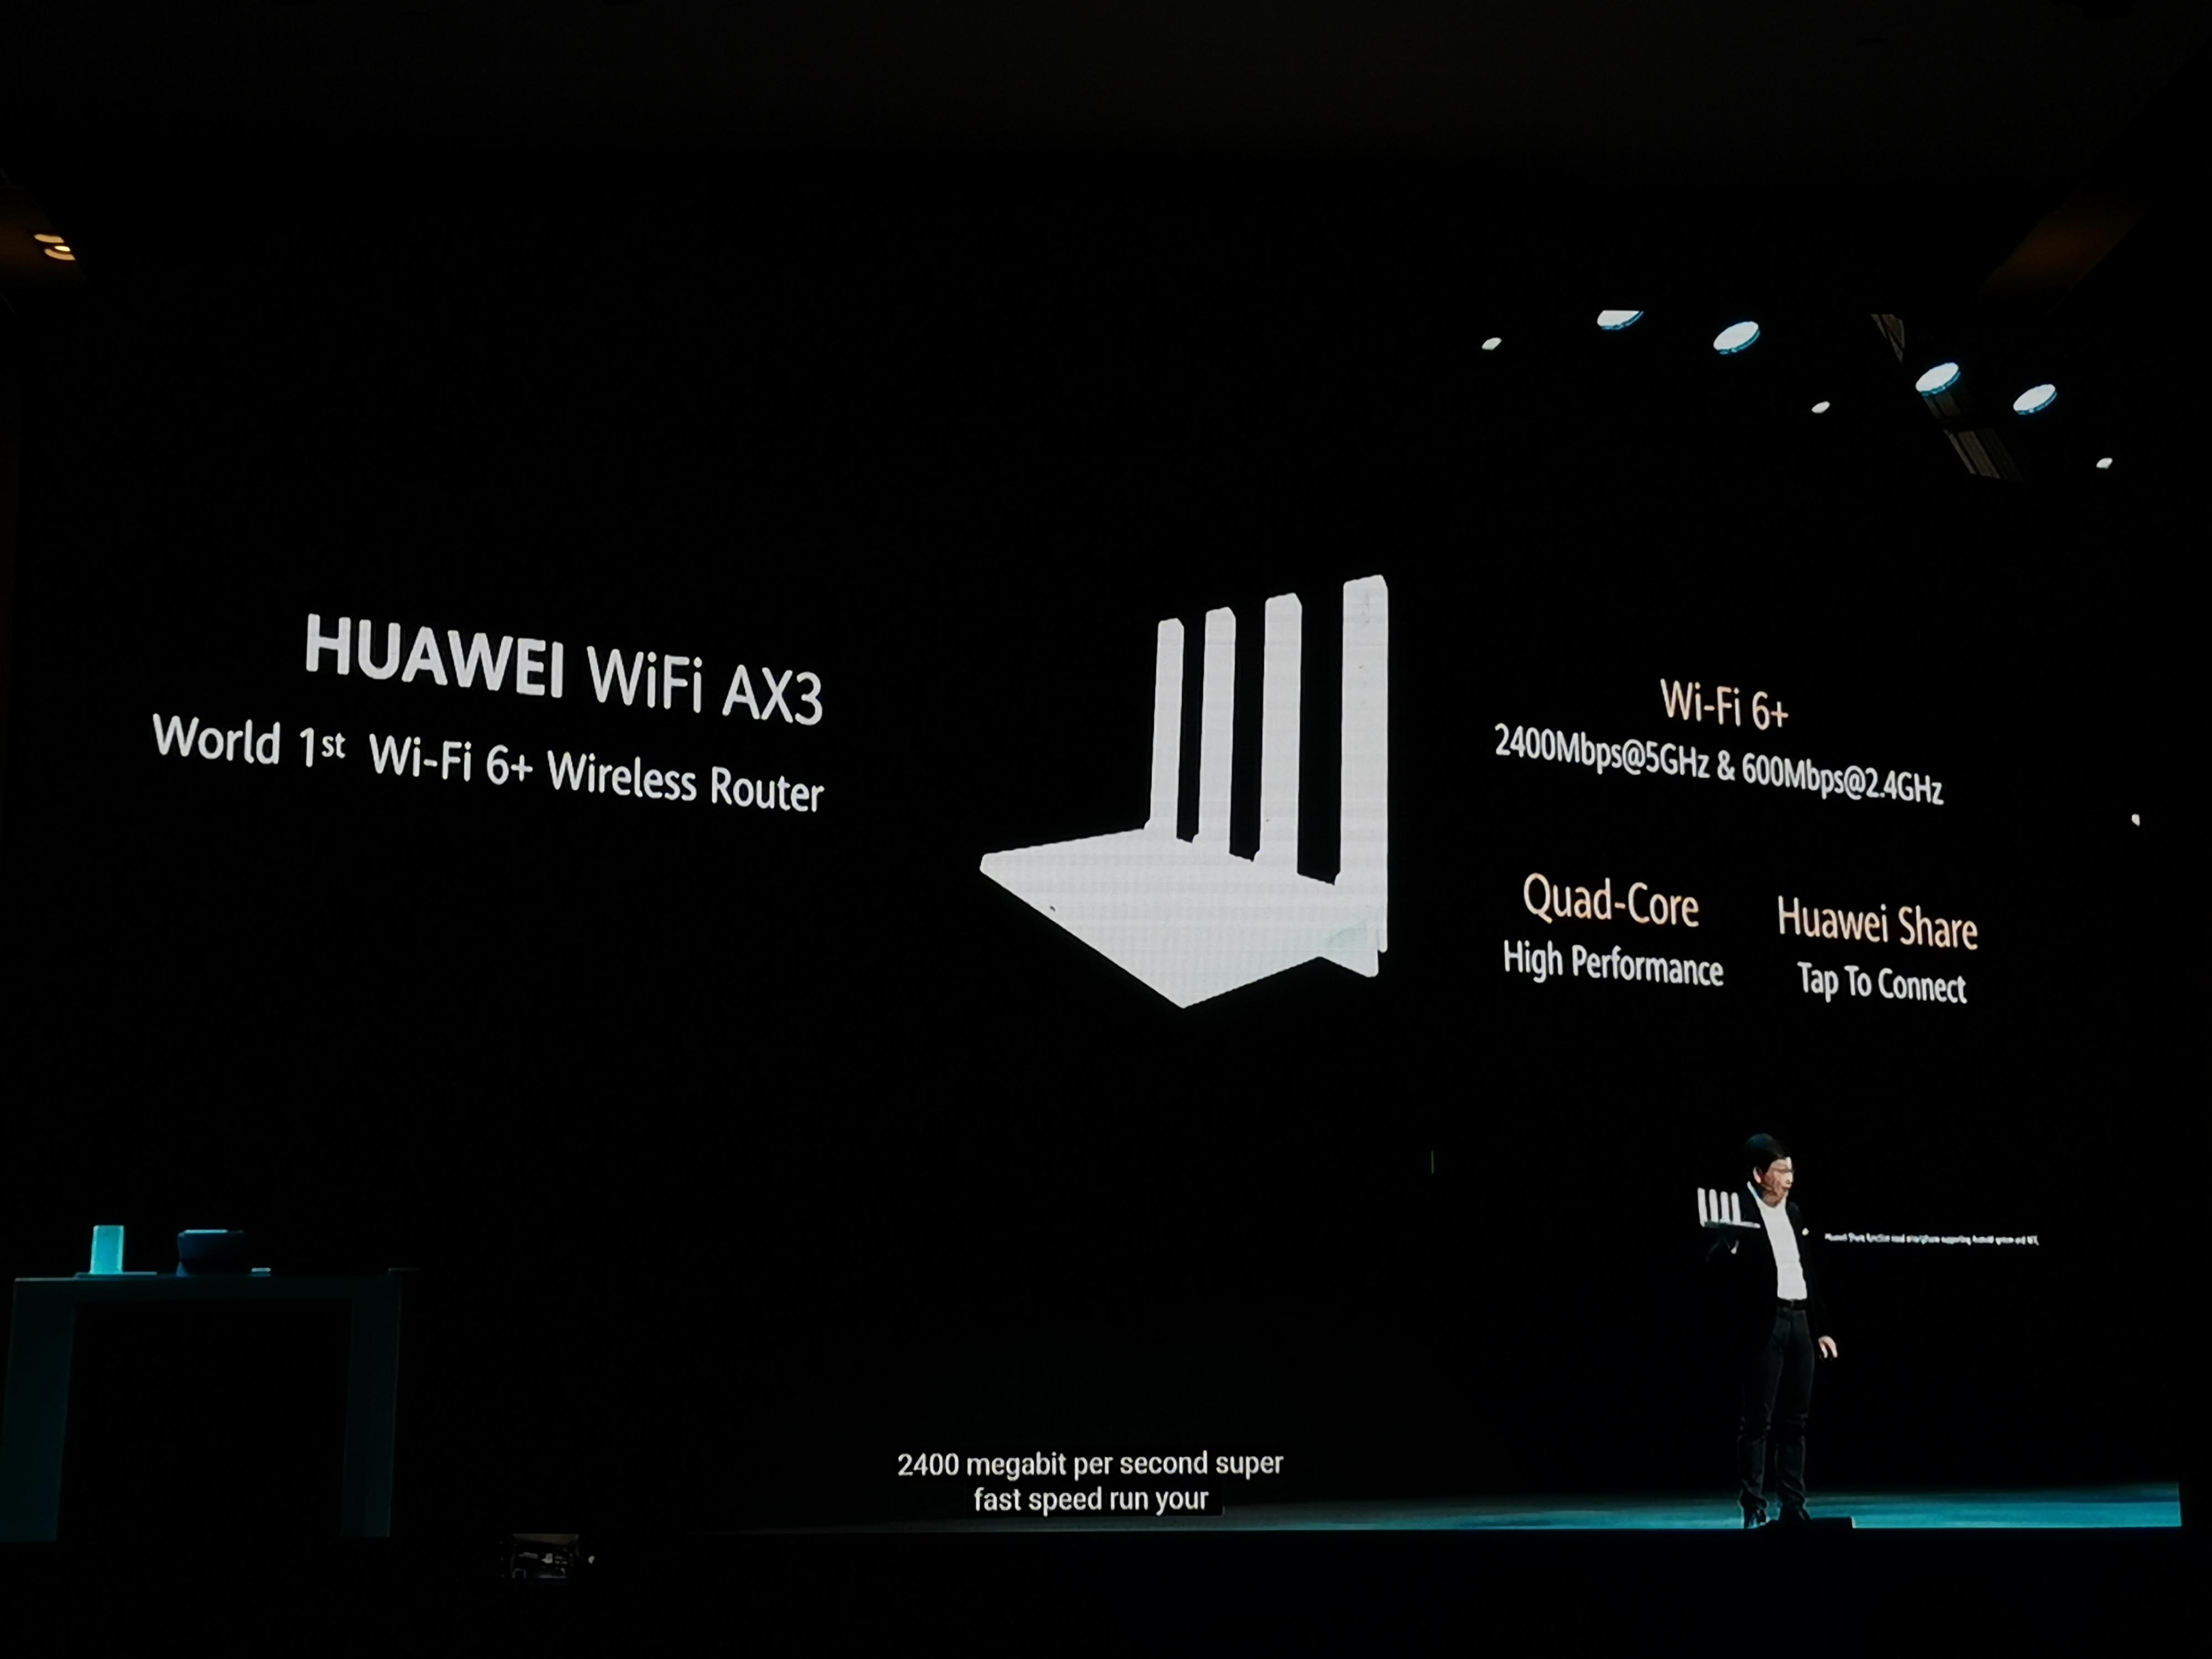 Huawei Wi-Fi AX3